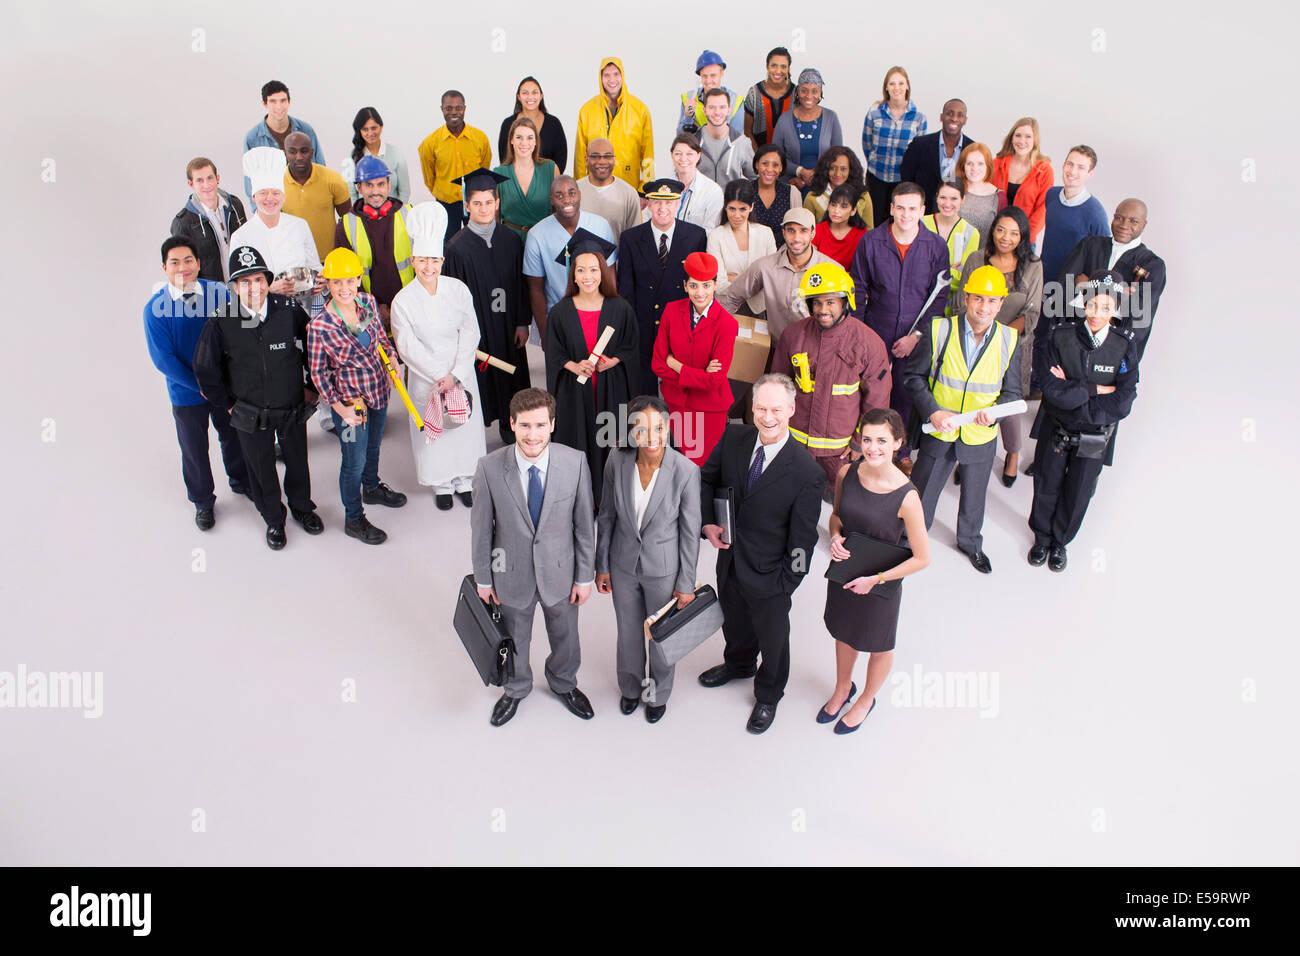 Fuerza laboral diversa Imagen De Stock